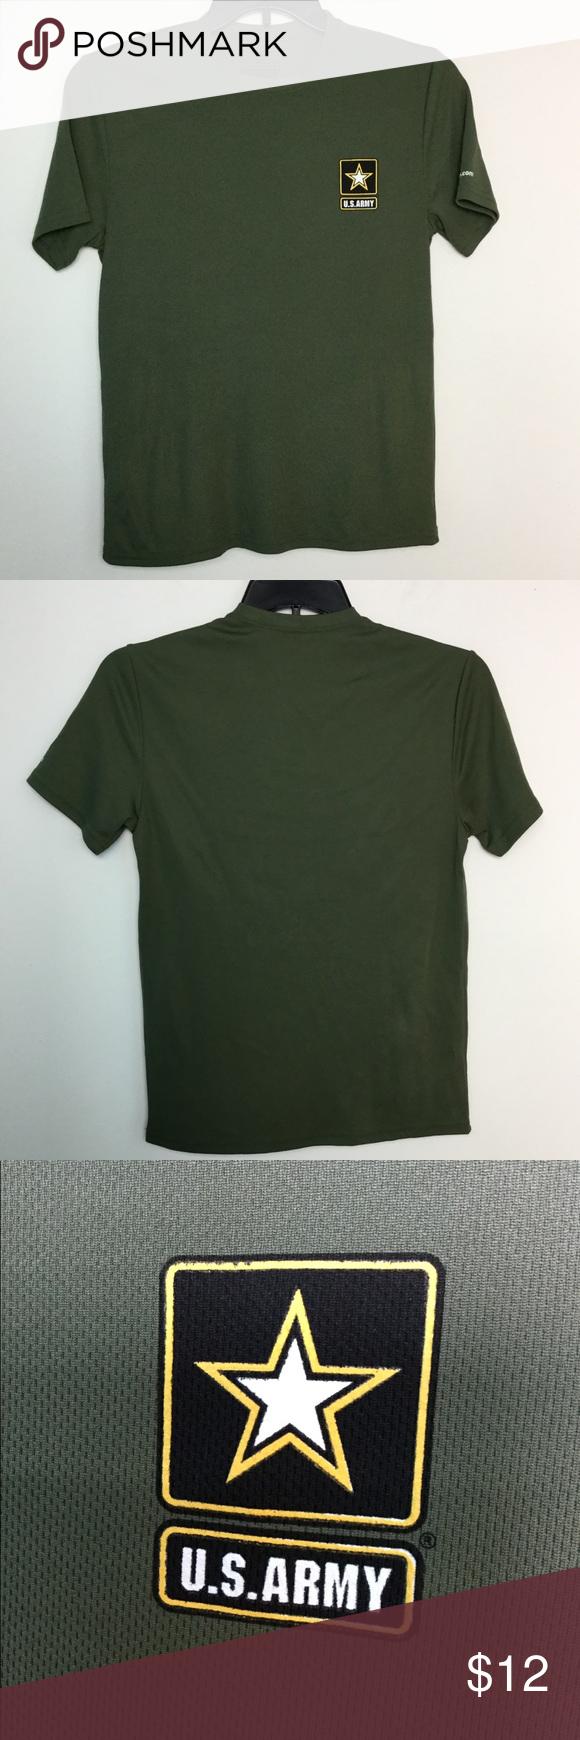 U S Army S Shirt Dri Fit Green Tee Men S Top Euc Mens Tees Army Shirts Dri Fit